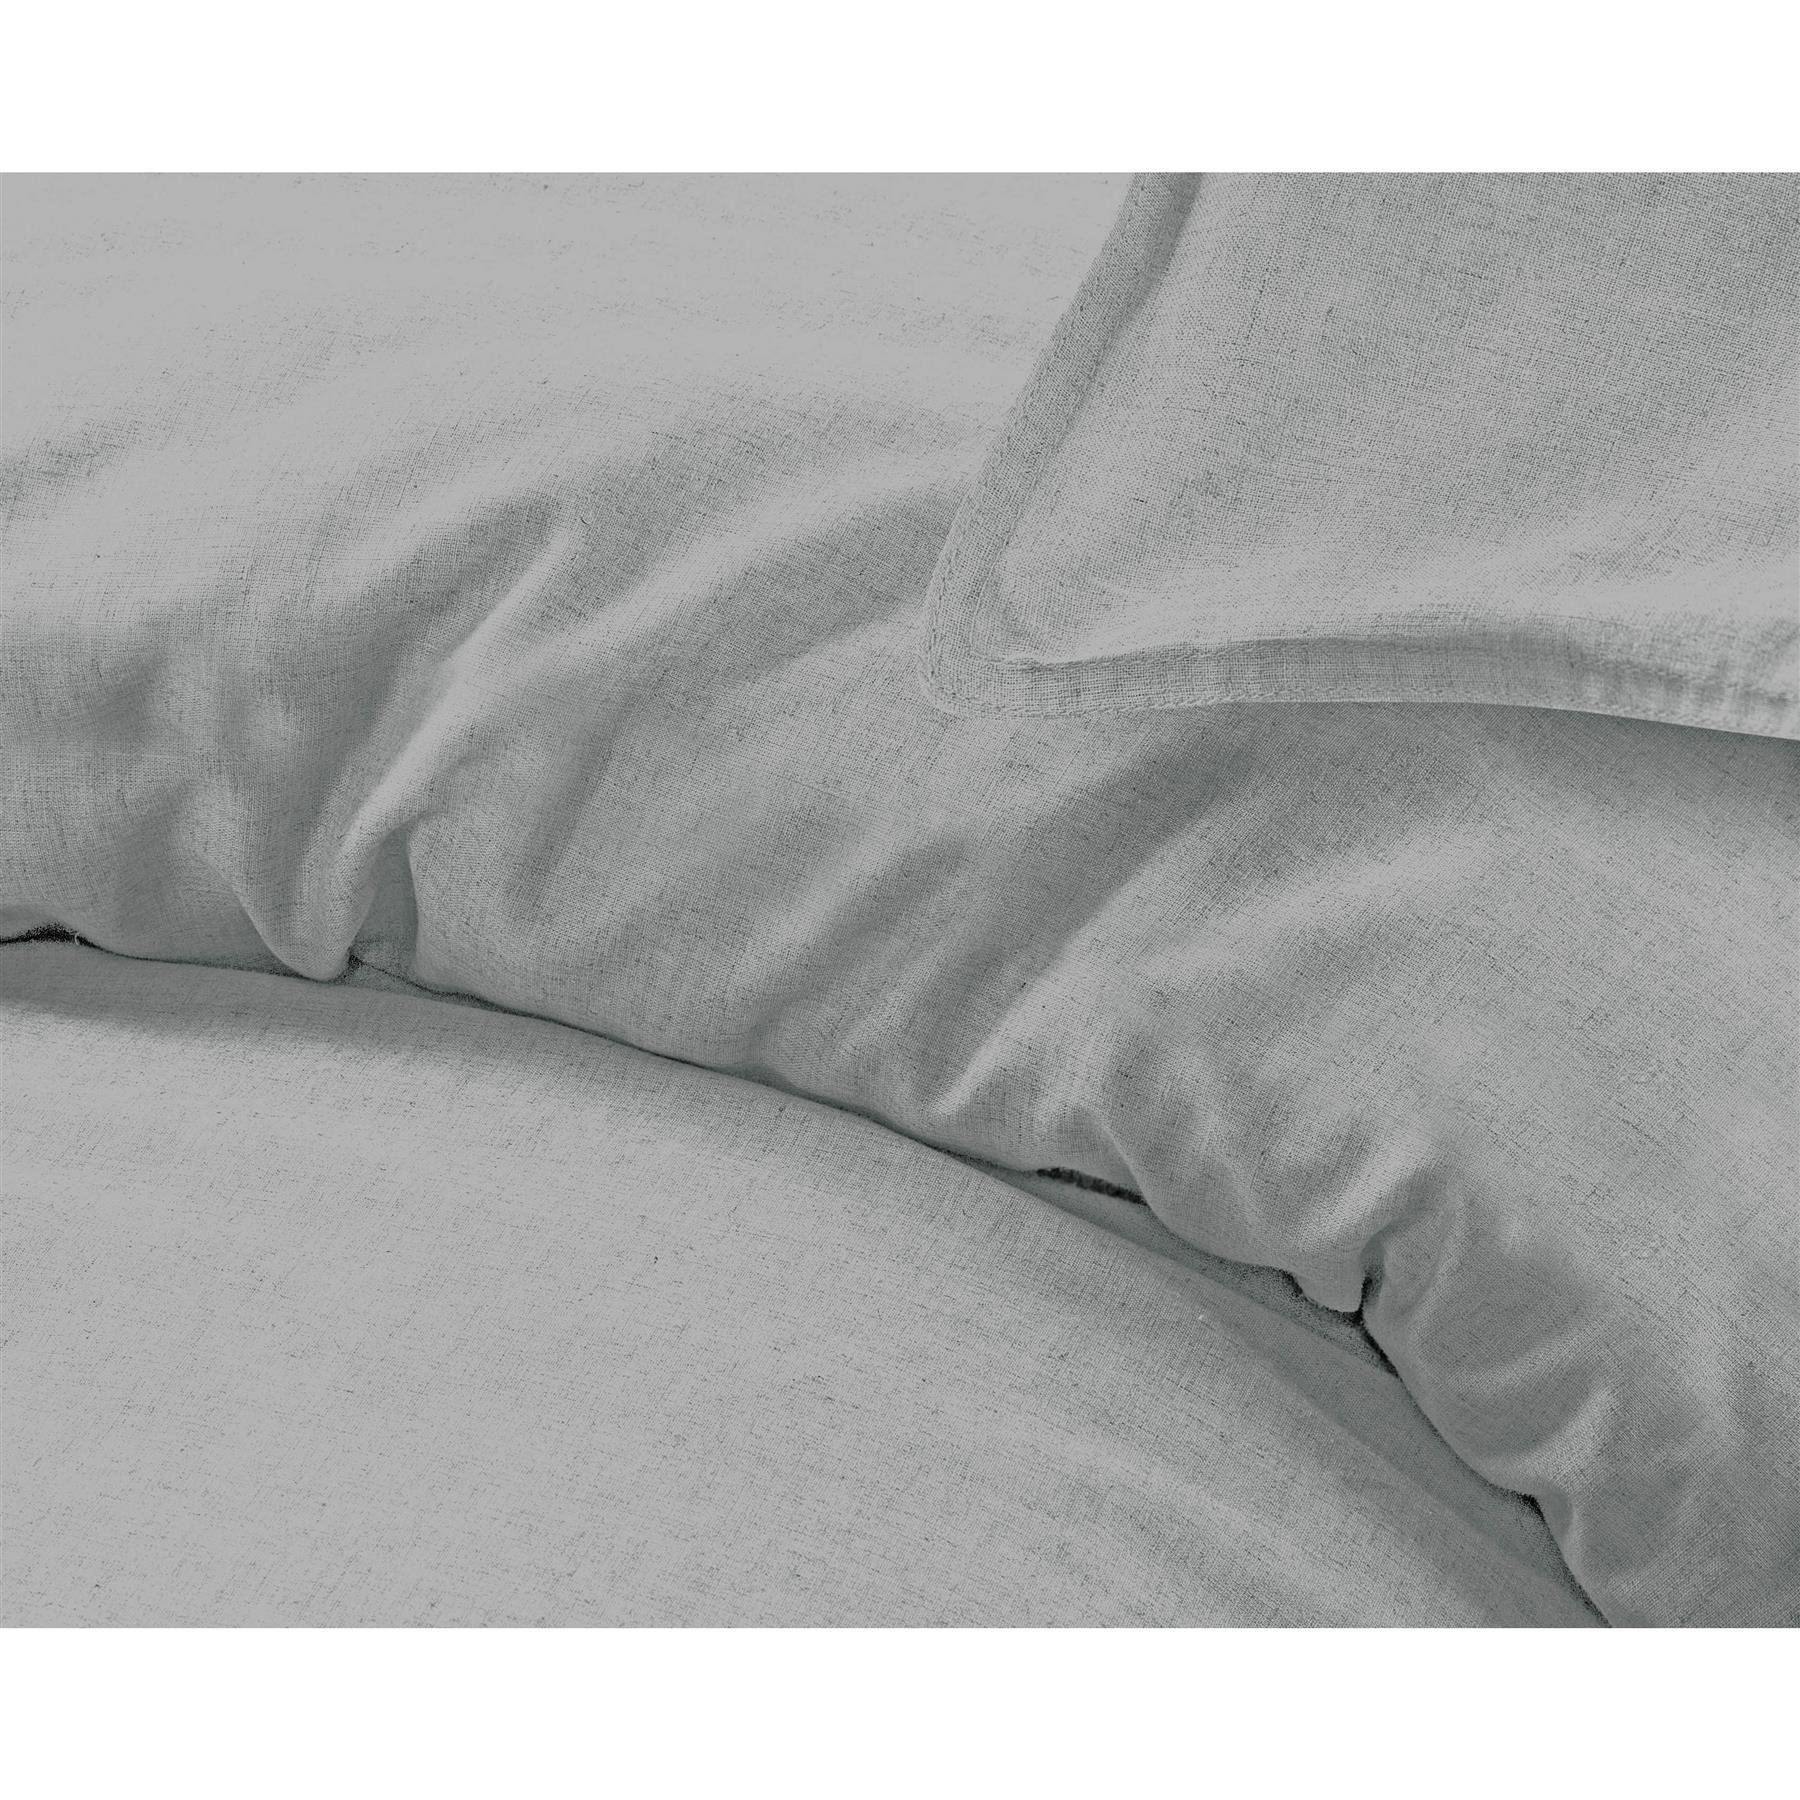 Nimsay-Home-De-Lujo-100-Algodon-Lino-Cubierta-del-edredon-edredon-natural-del-lecho-del miniatura 20